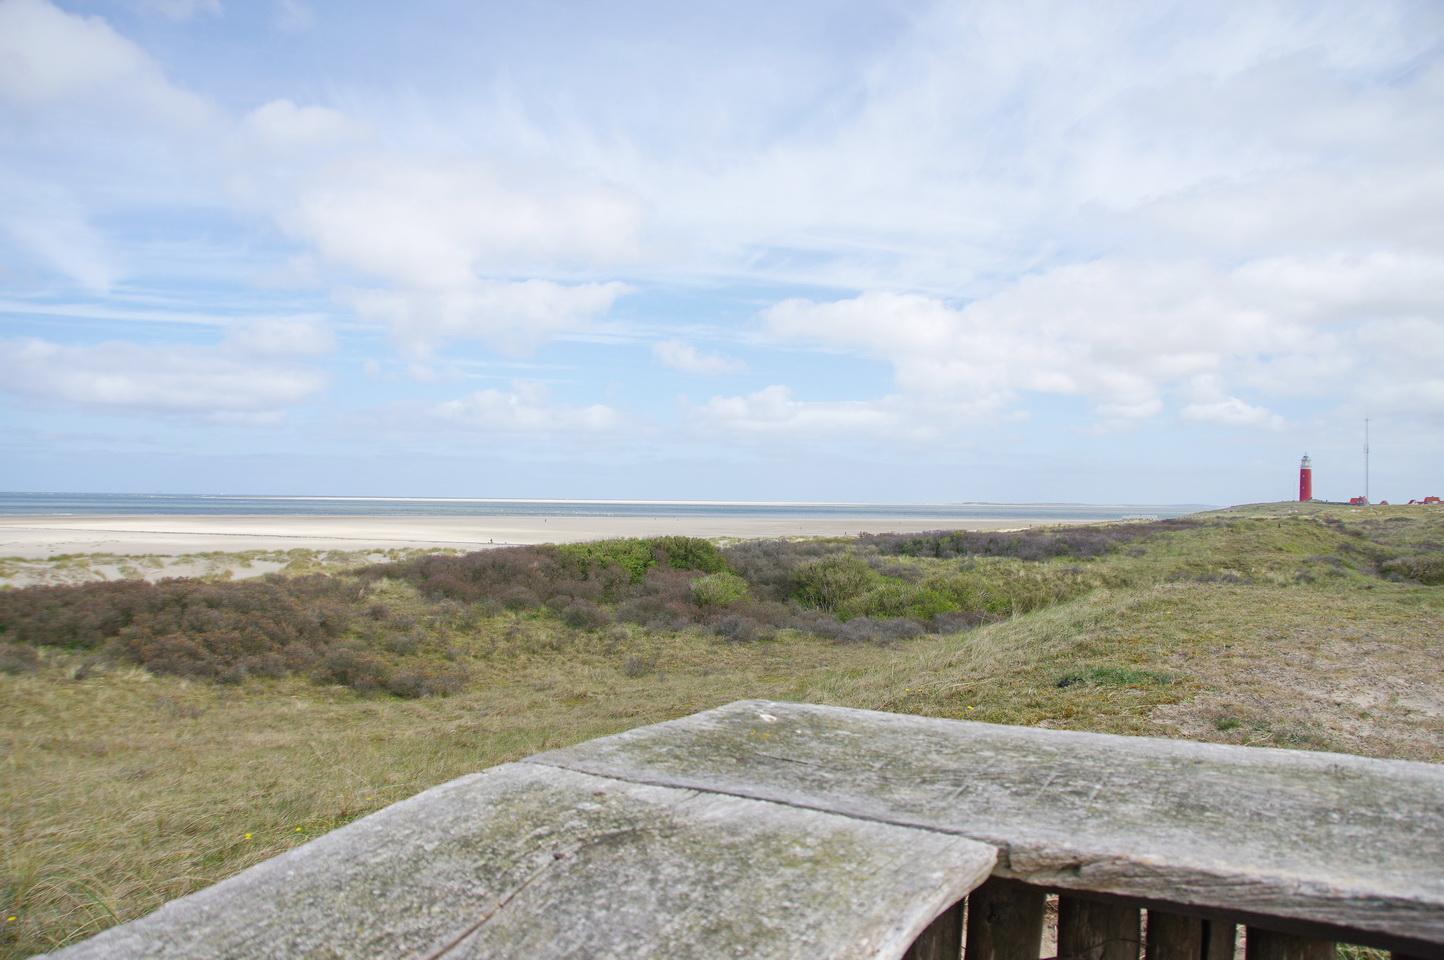 Texel - Strandspaziergang Leuchtturm TH 6